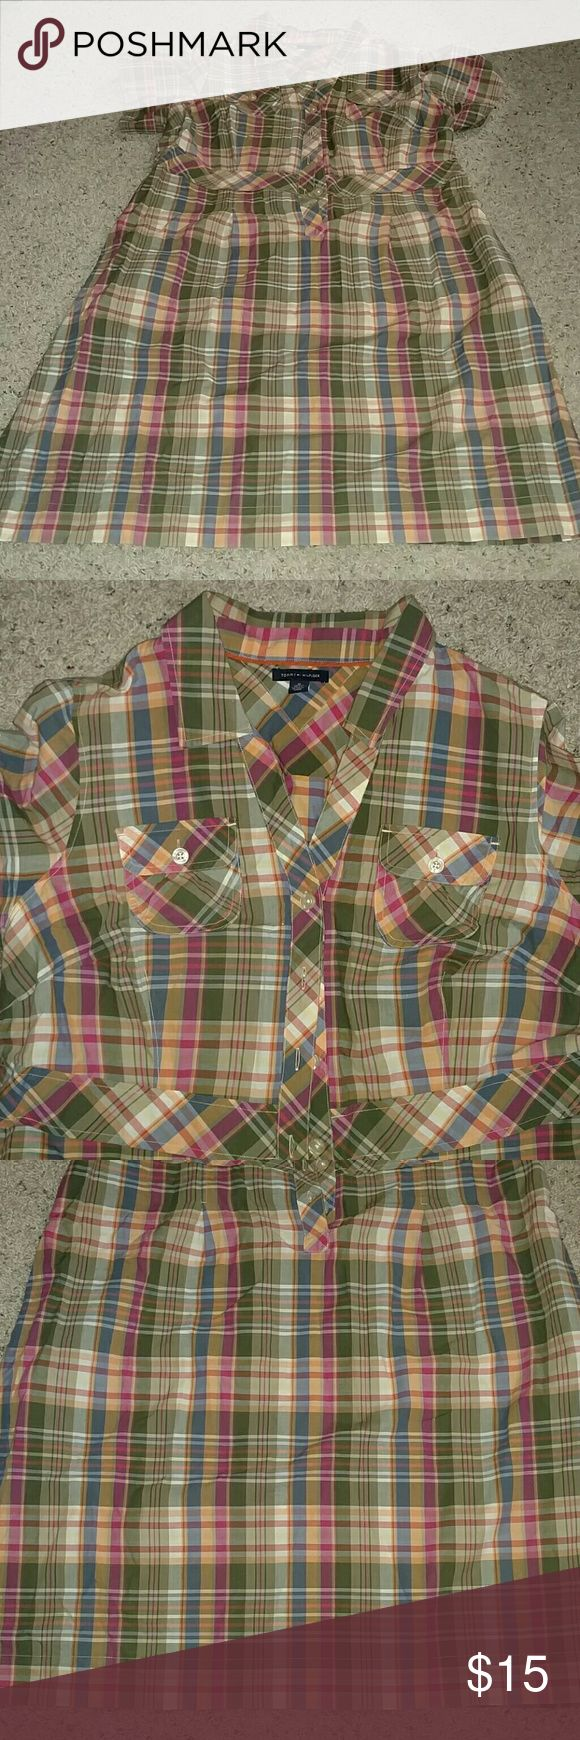 Tommy Hilfiger Khaki shirt dress Tommy Hilfiger khaki shorts dress with side pockets. Tommy Hilfiger Dresses